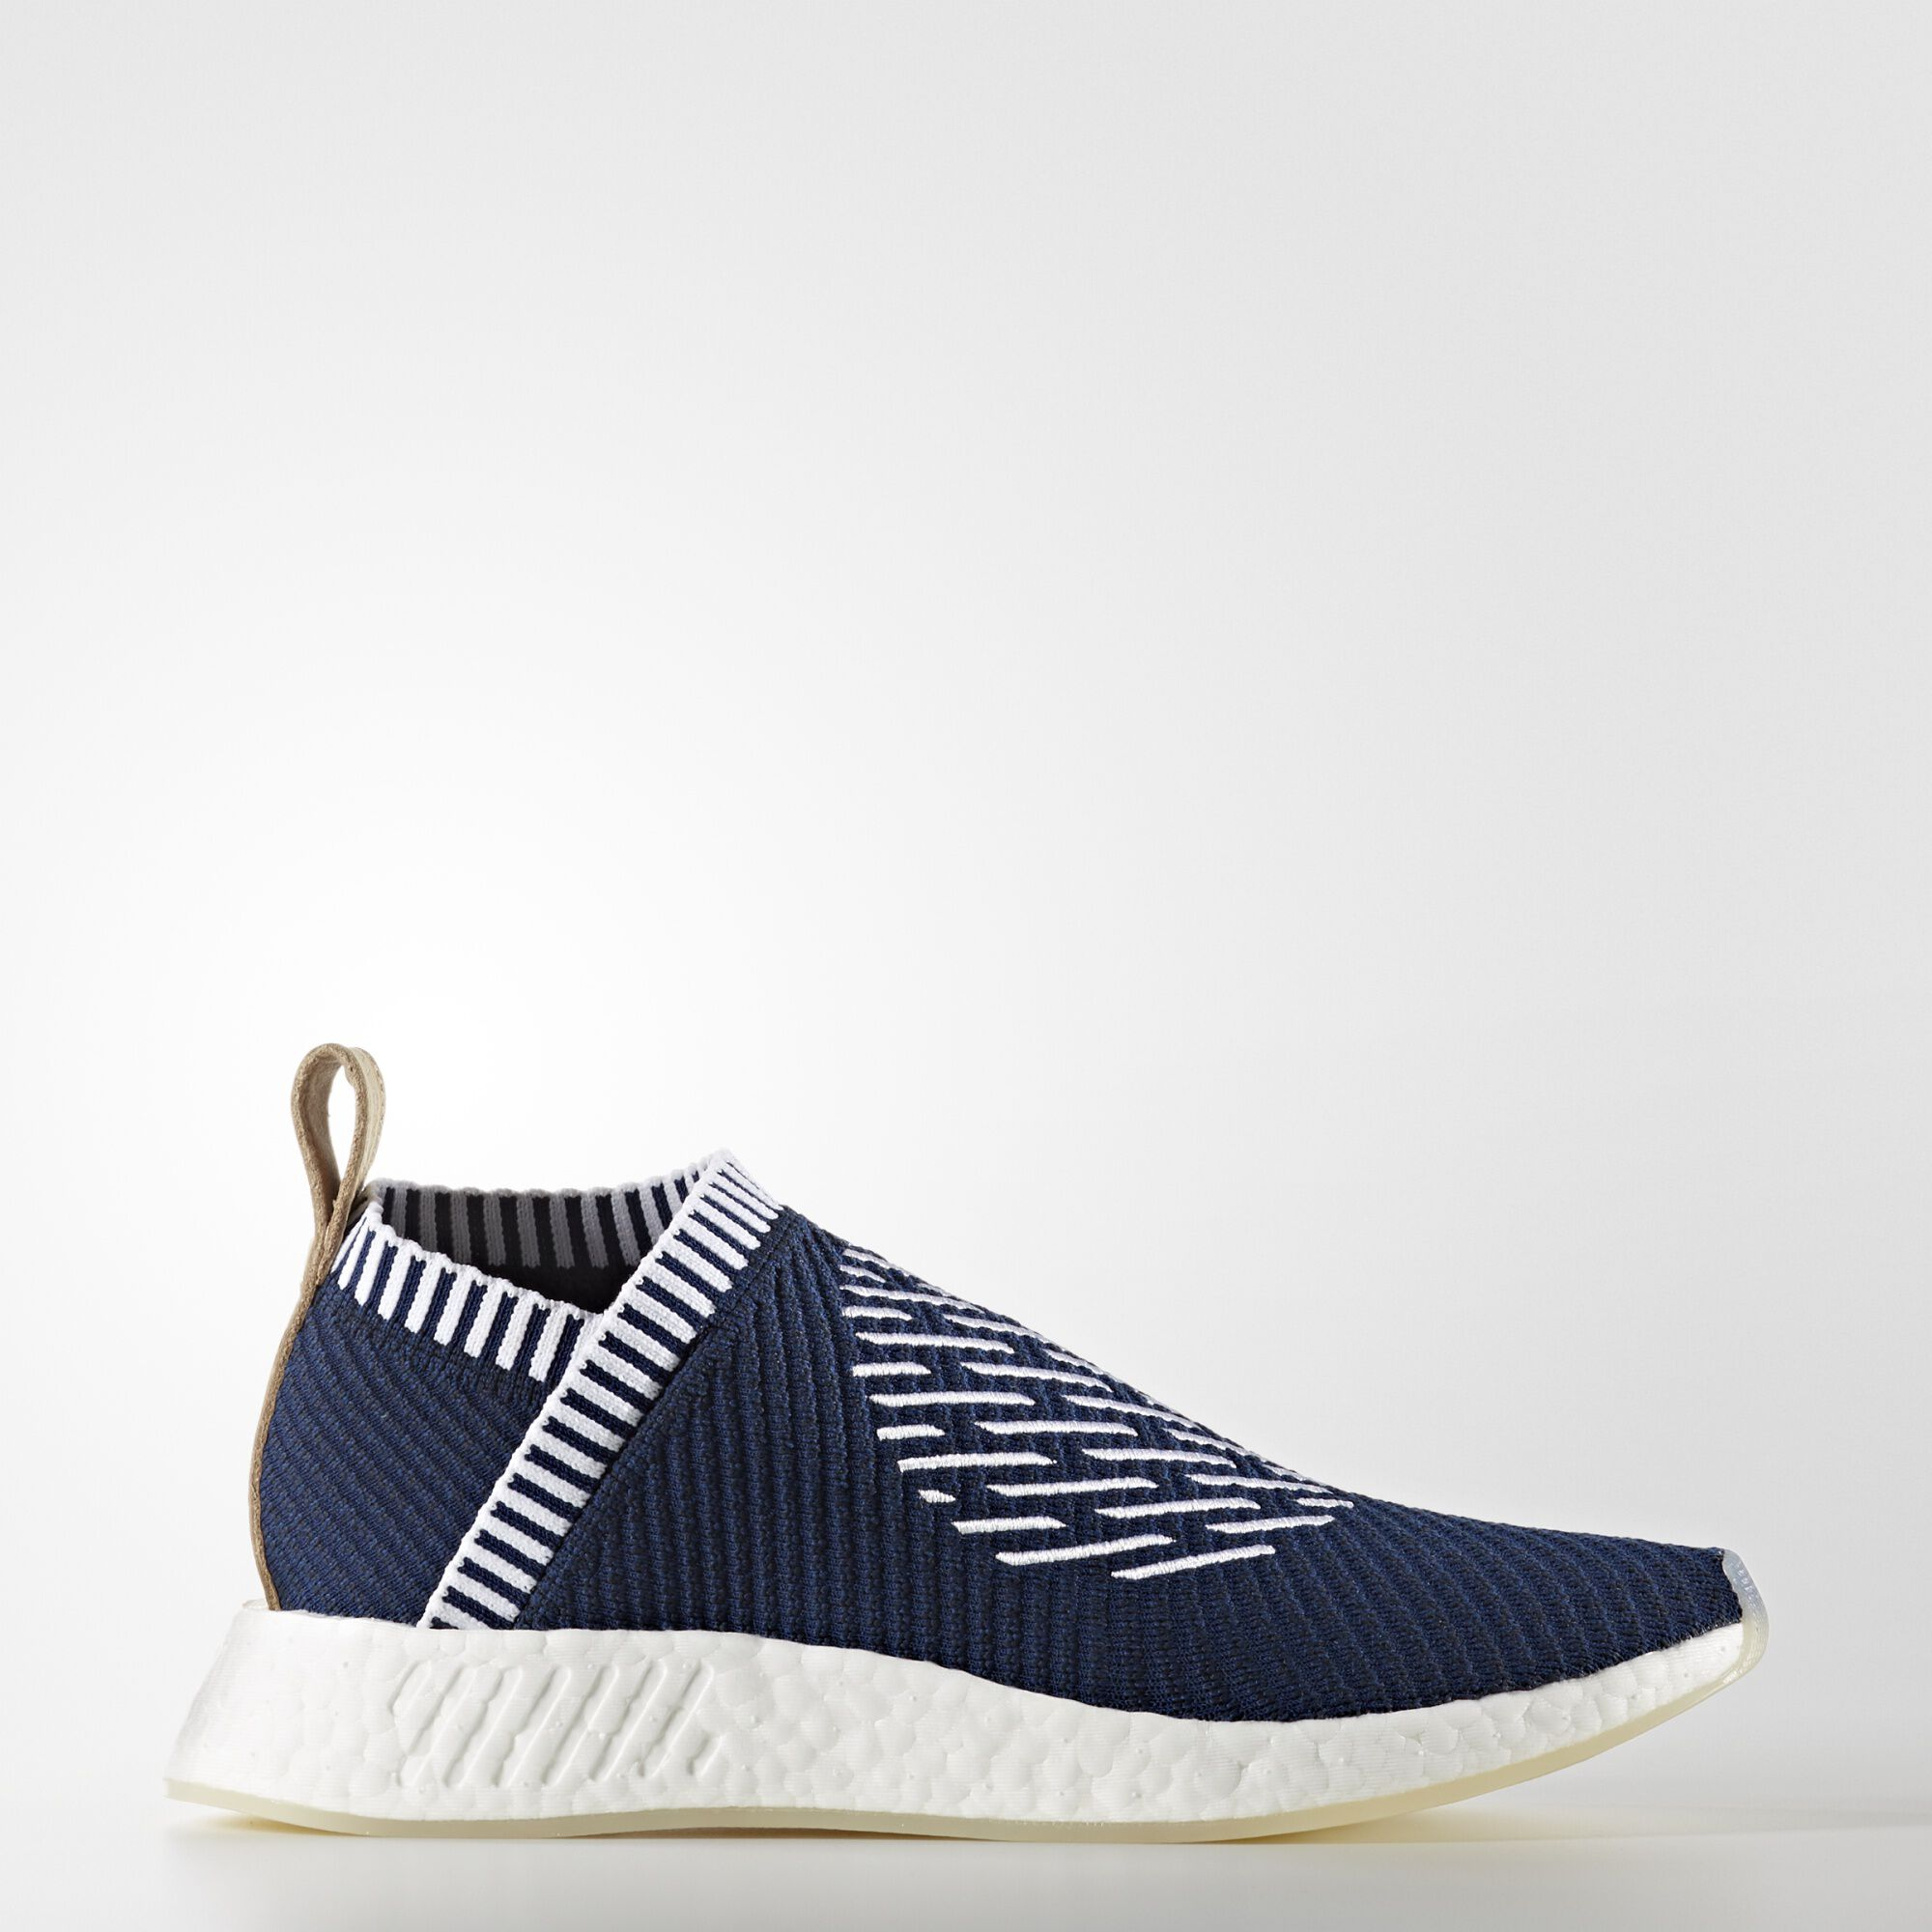 adidas nmd c shop